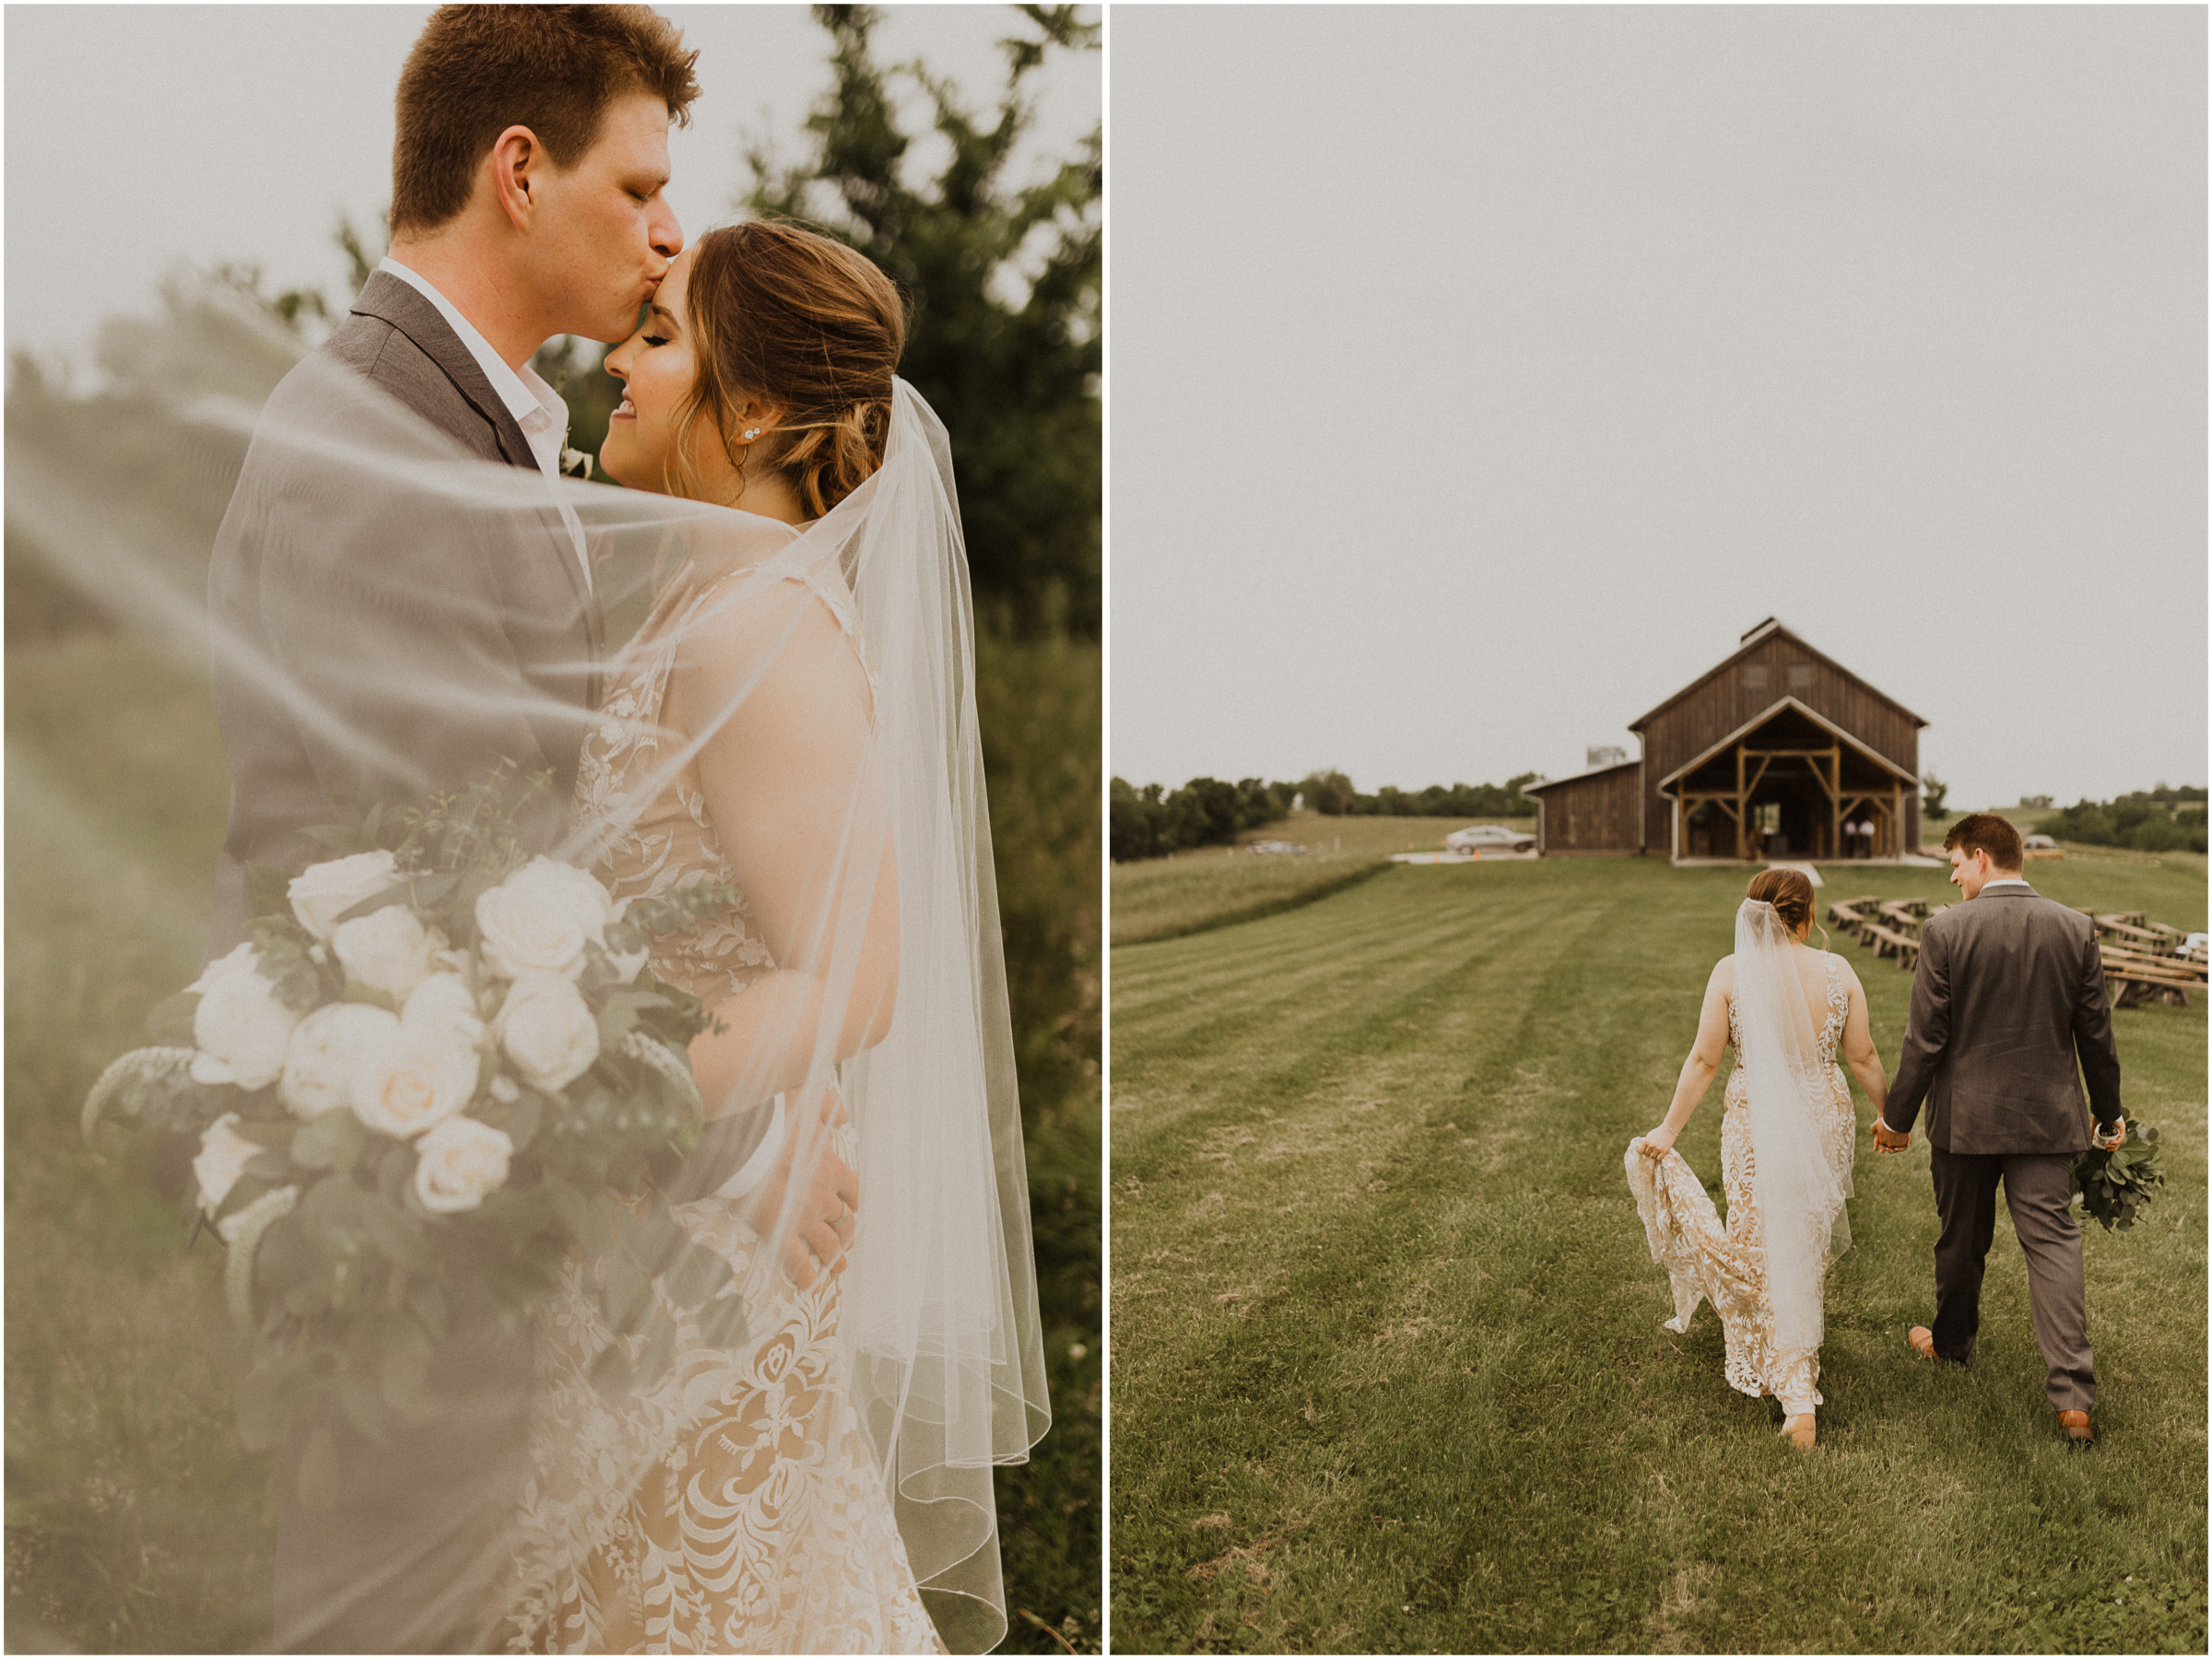 alyssa barletter photography weston red barn farm timberbarn summer outdoor wedding-23.jpg